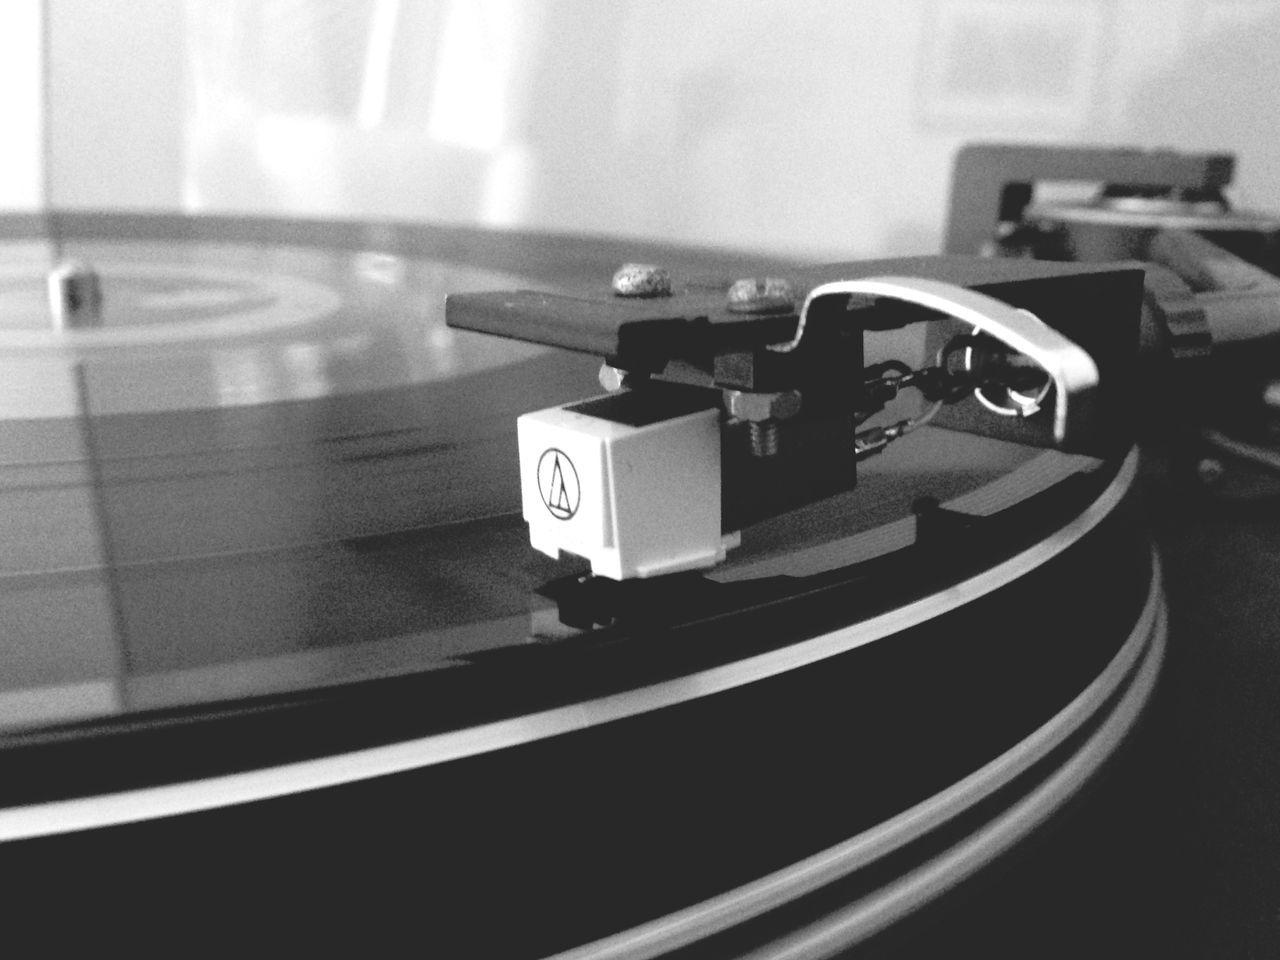 It's Music time! Enjoying Life Listening To Music Black And White Blackandwhite